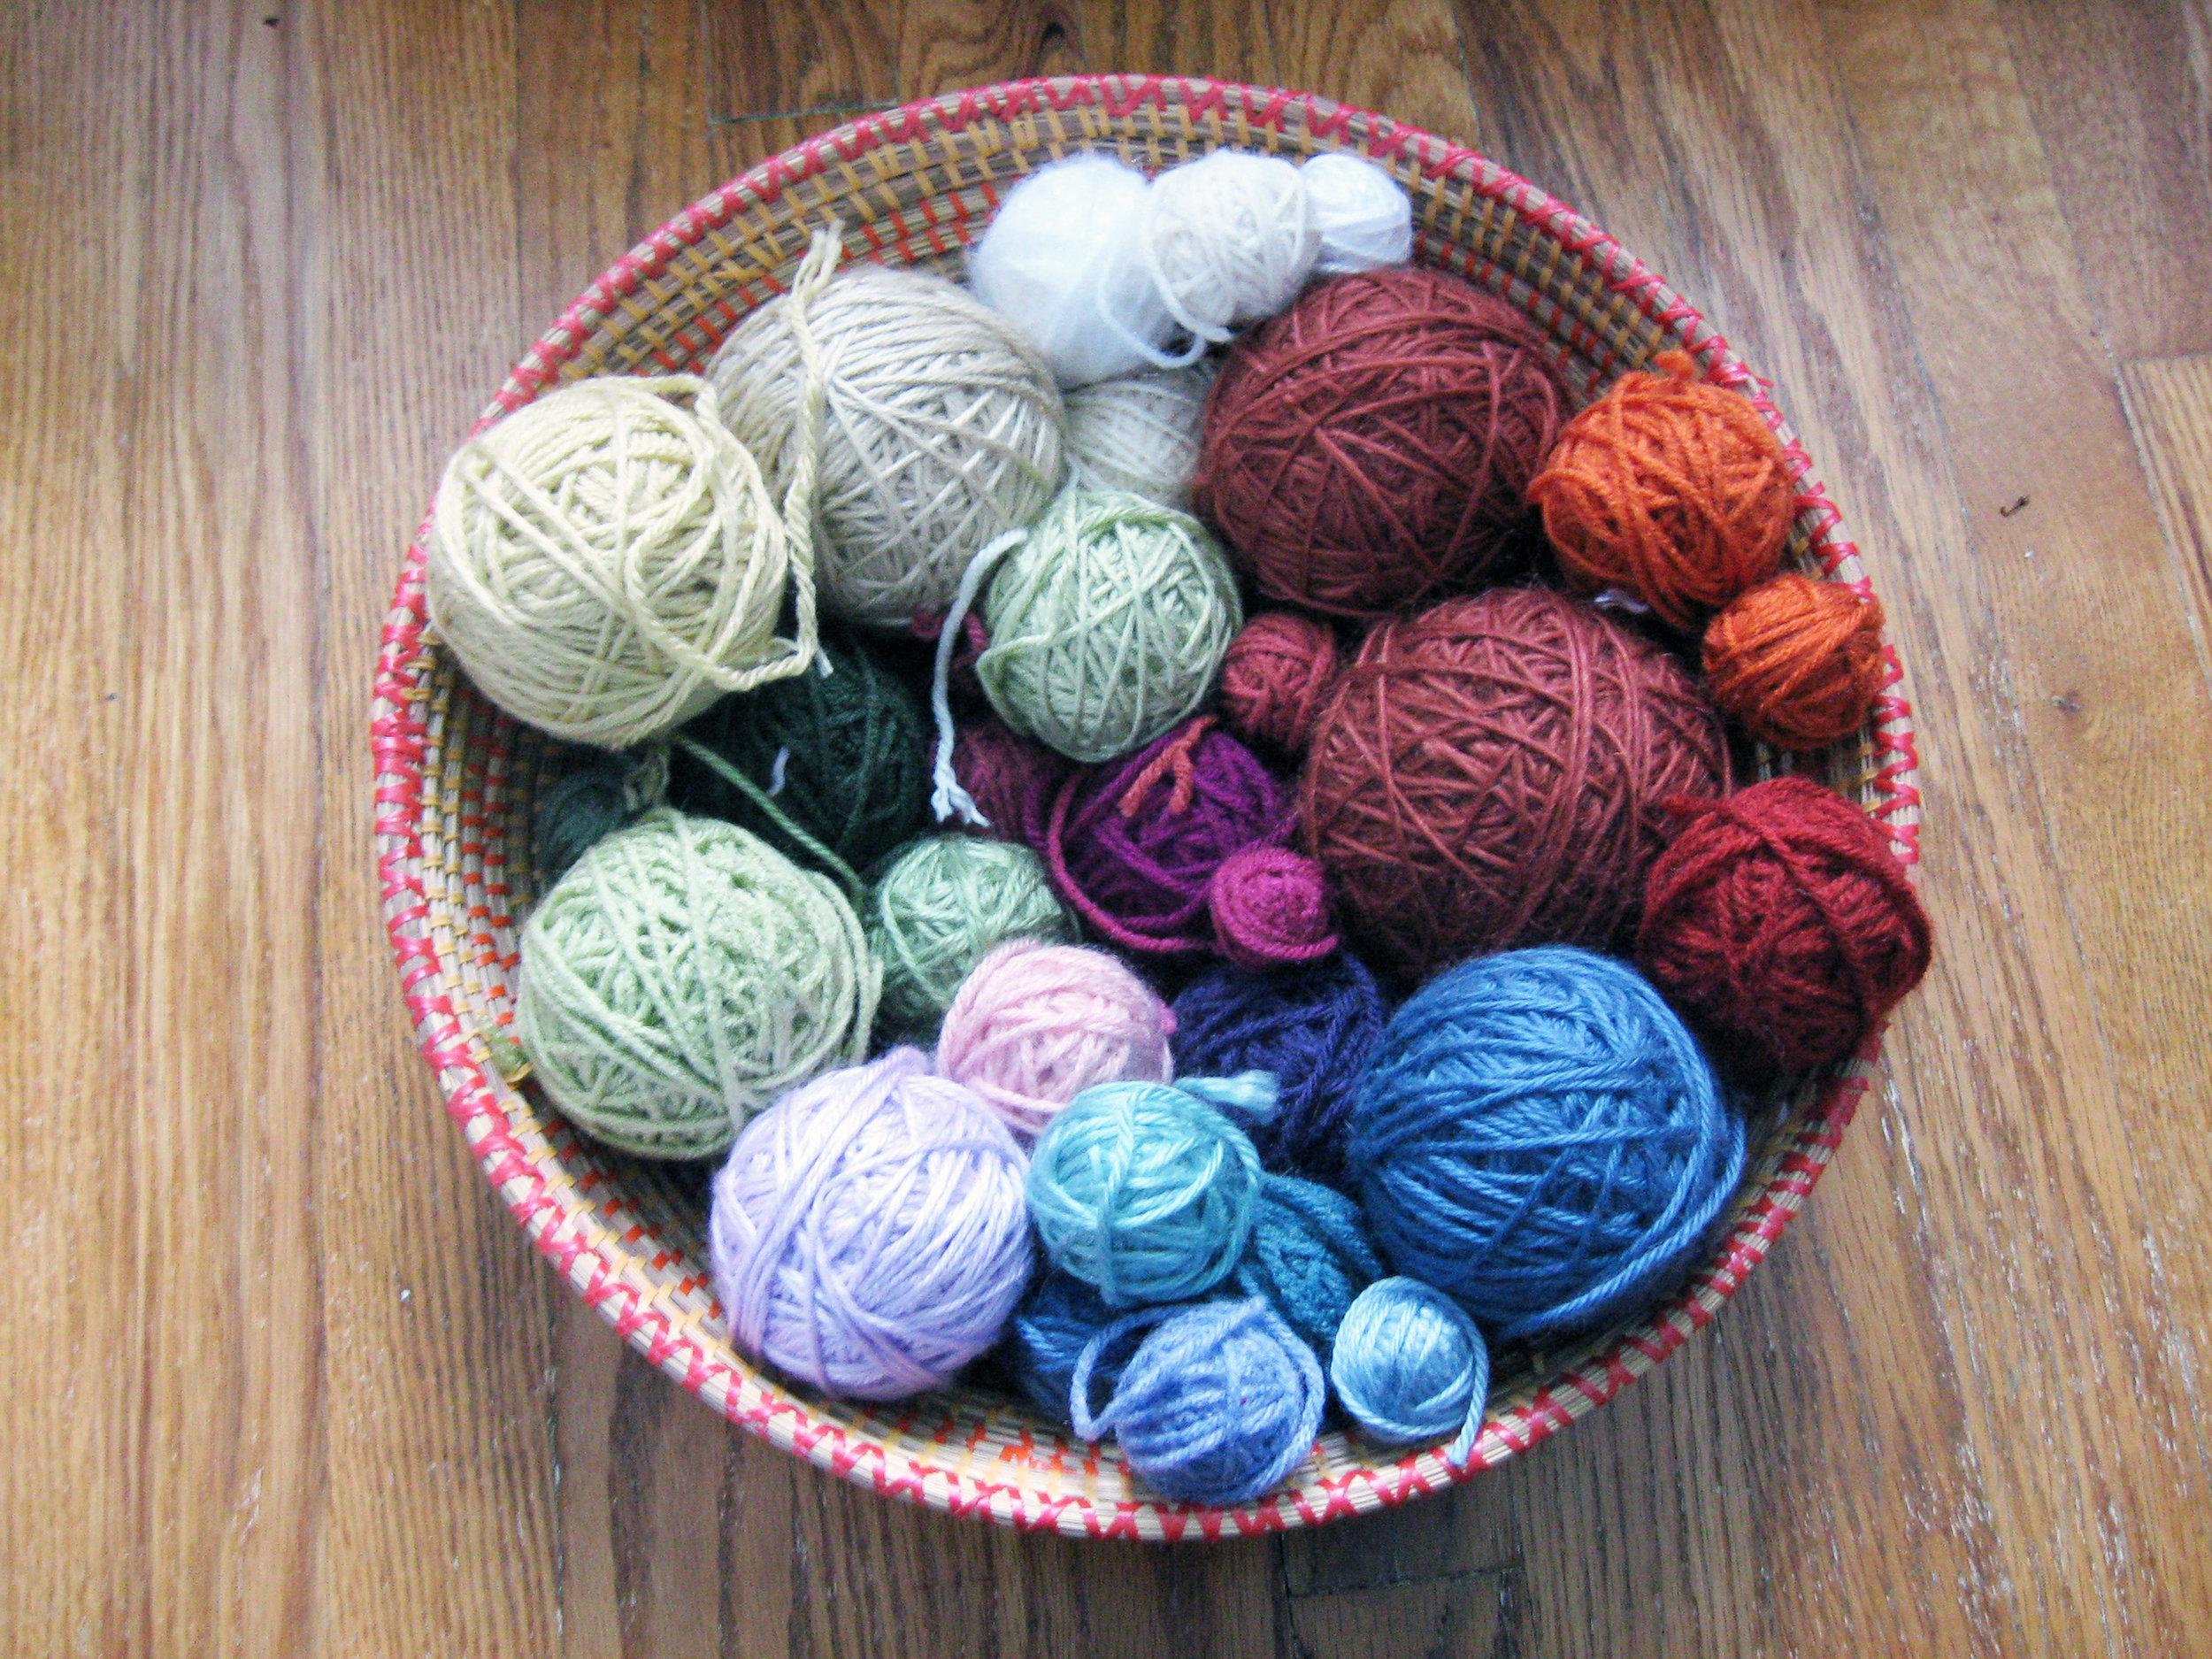 A Basket of Colorful Yarn is a Joyful Inspiration